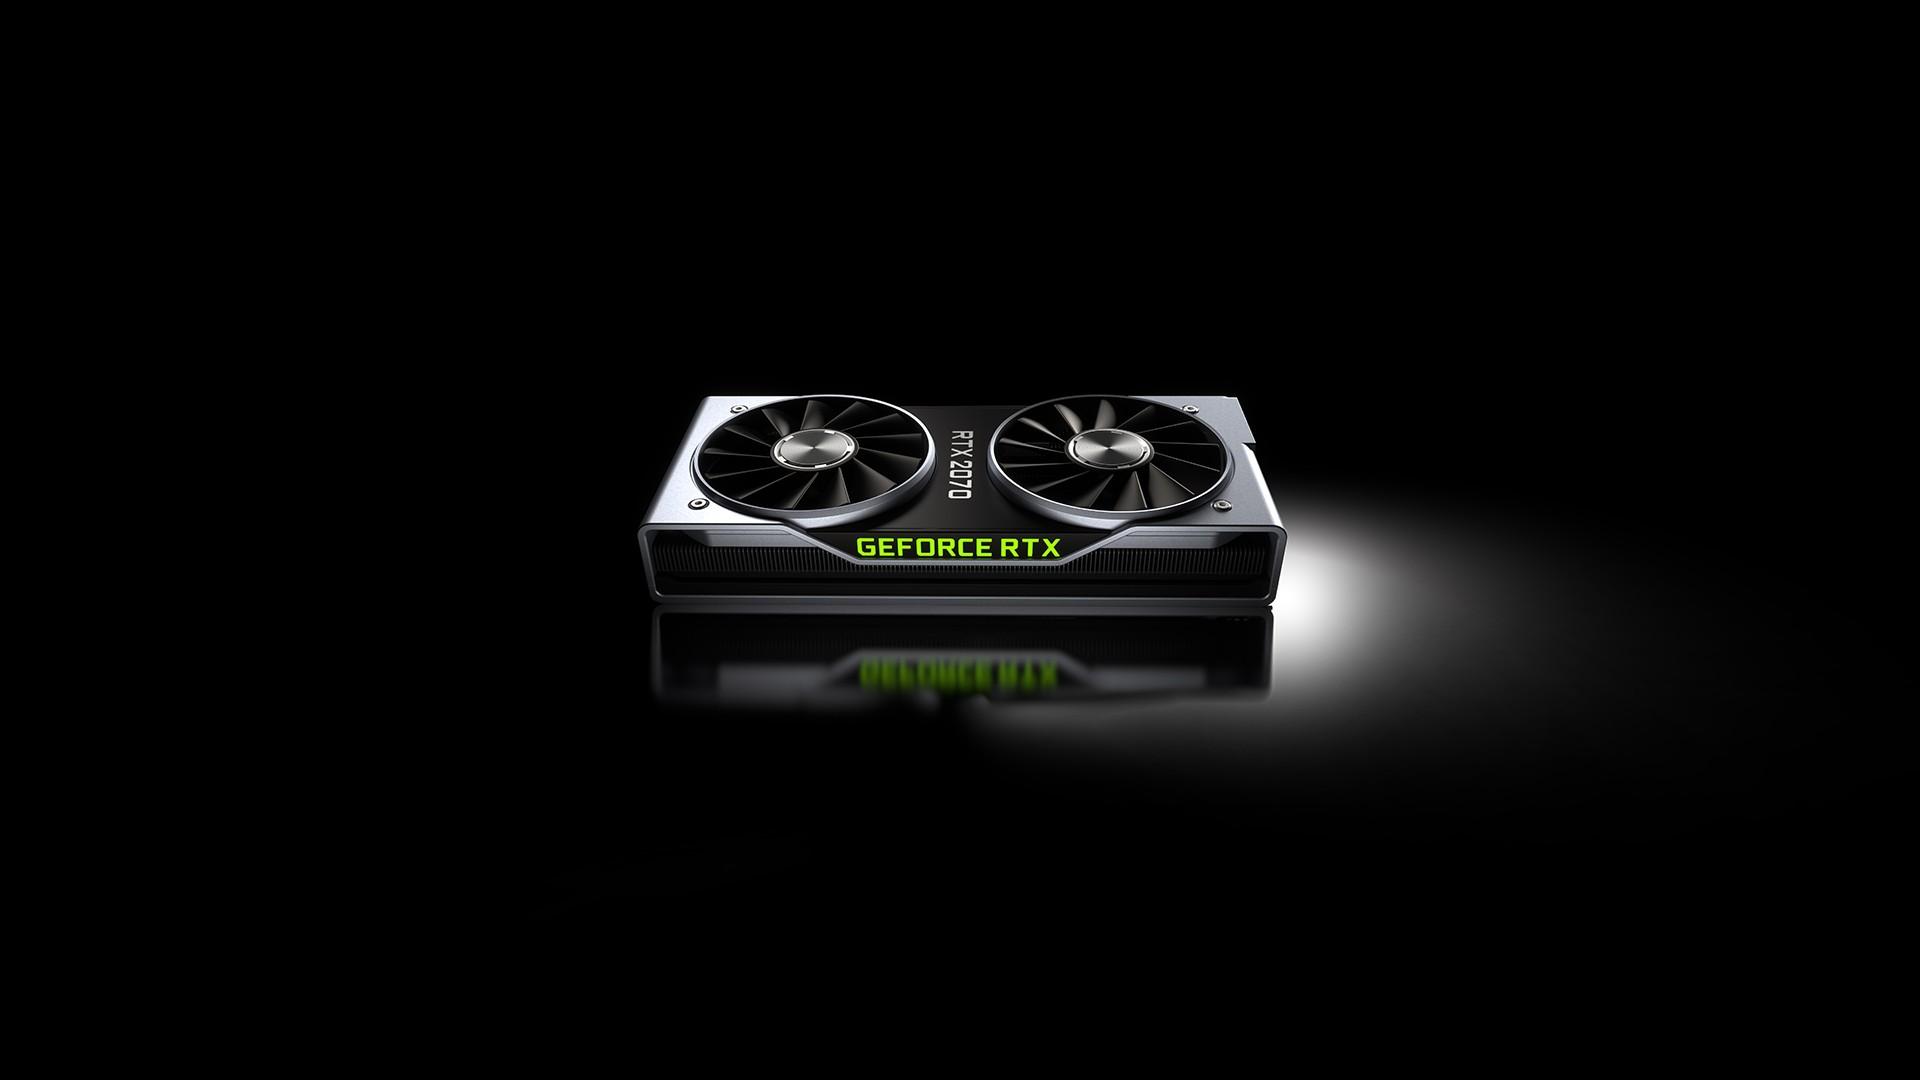 NVIDIA GeForce RTX 2070 - En helt ny sorts grafik